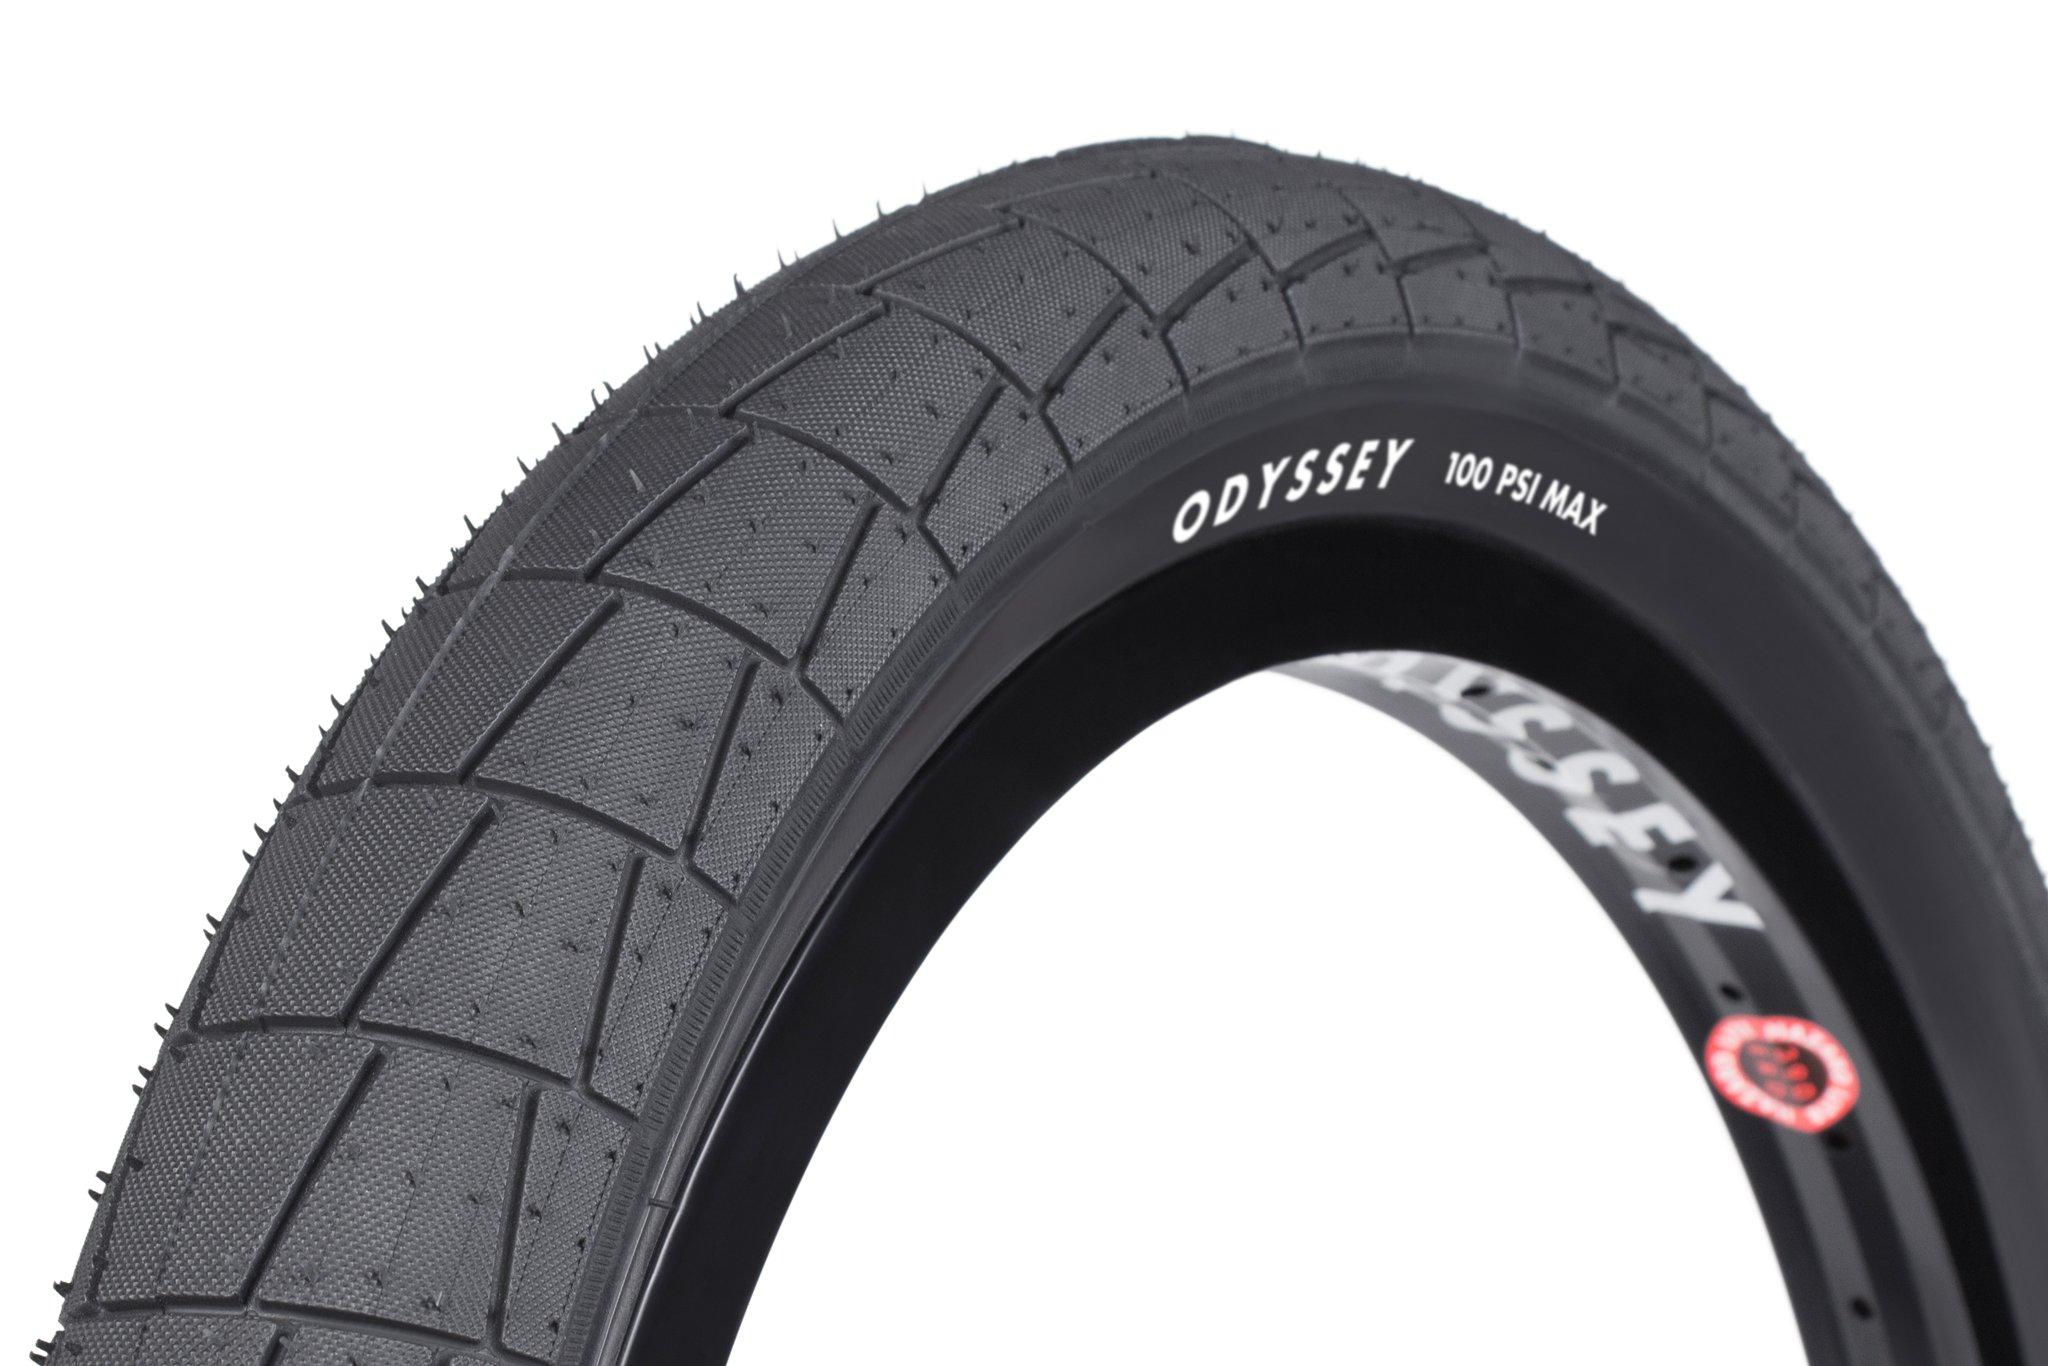 Odyssey Broc Tire | Black